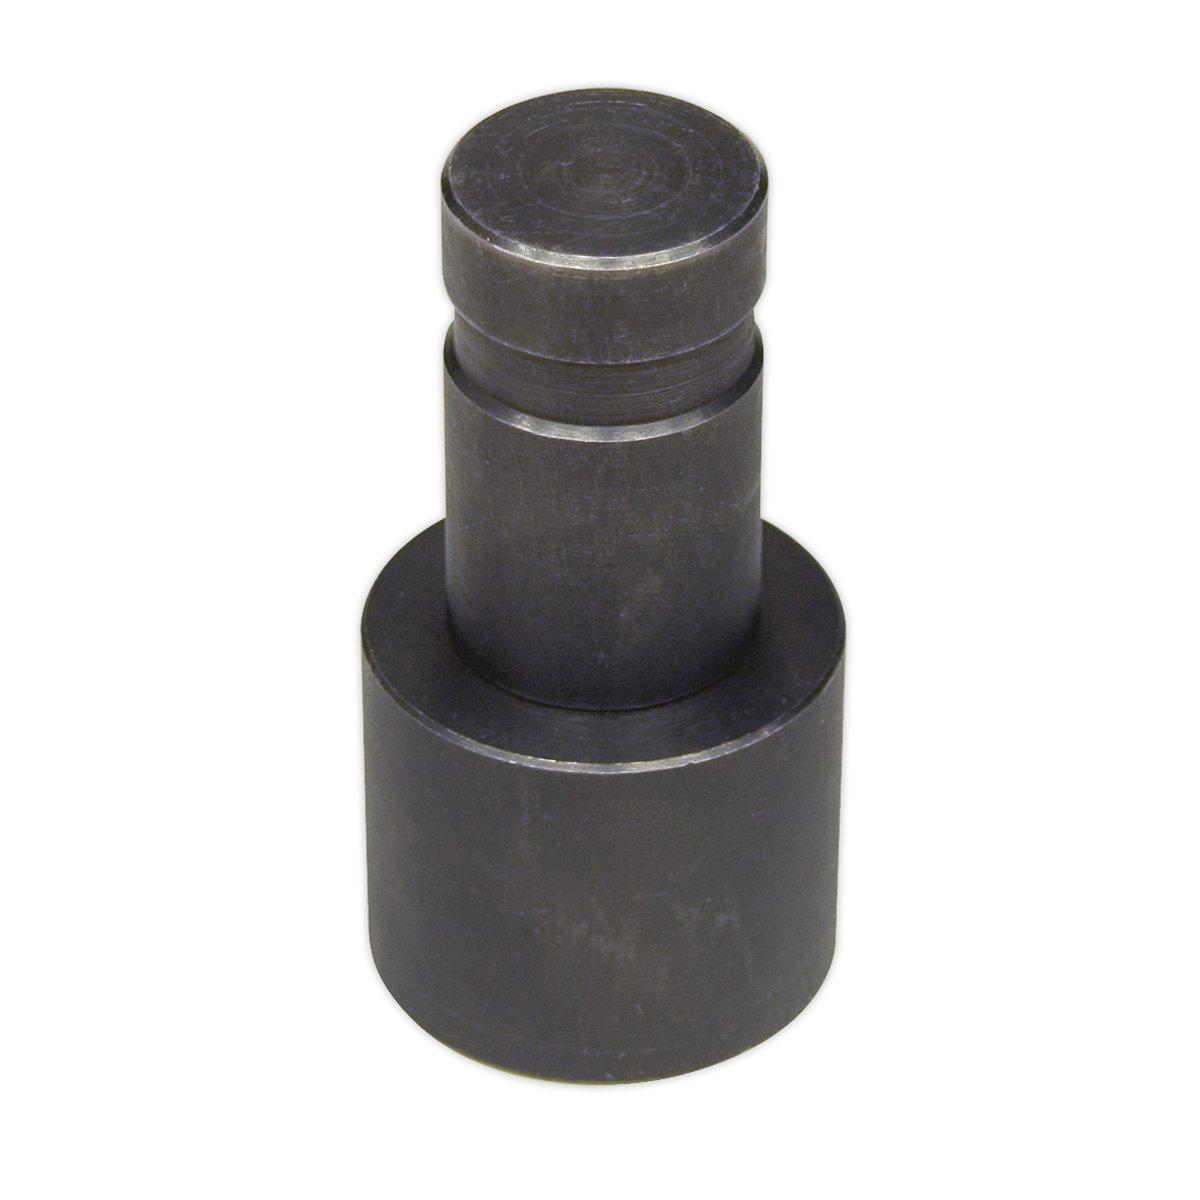 Adaptor for Oil Filter Crusher Ø50 x 115mm